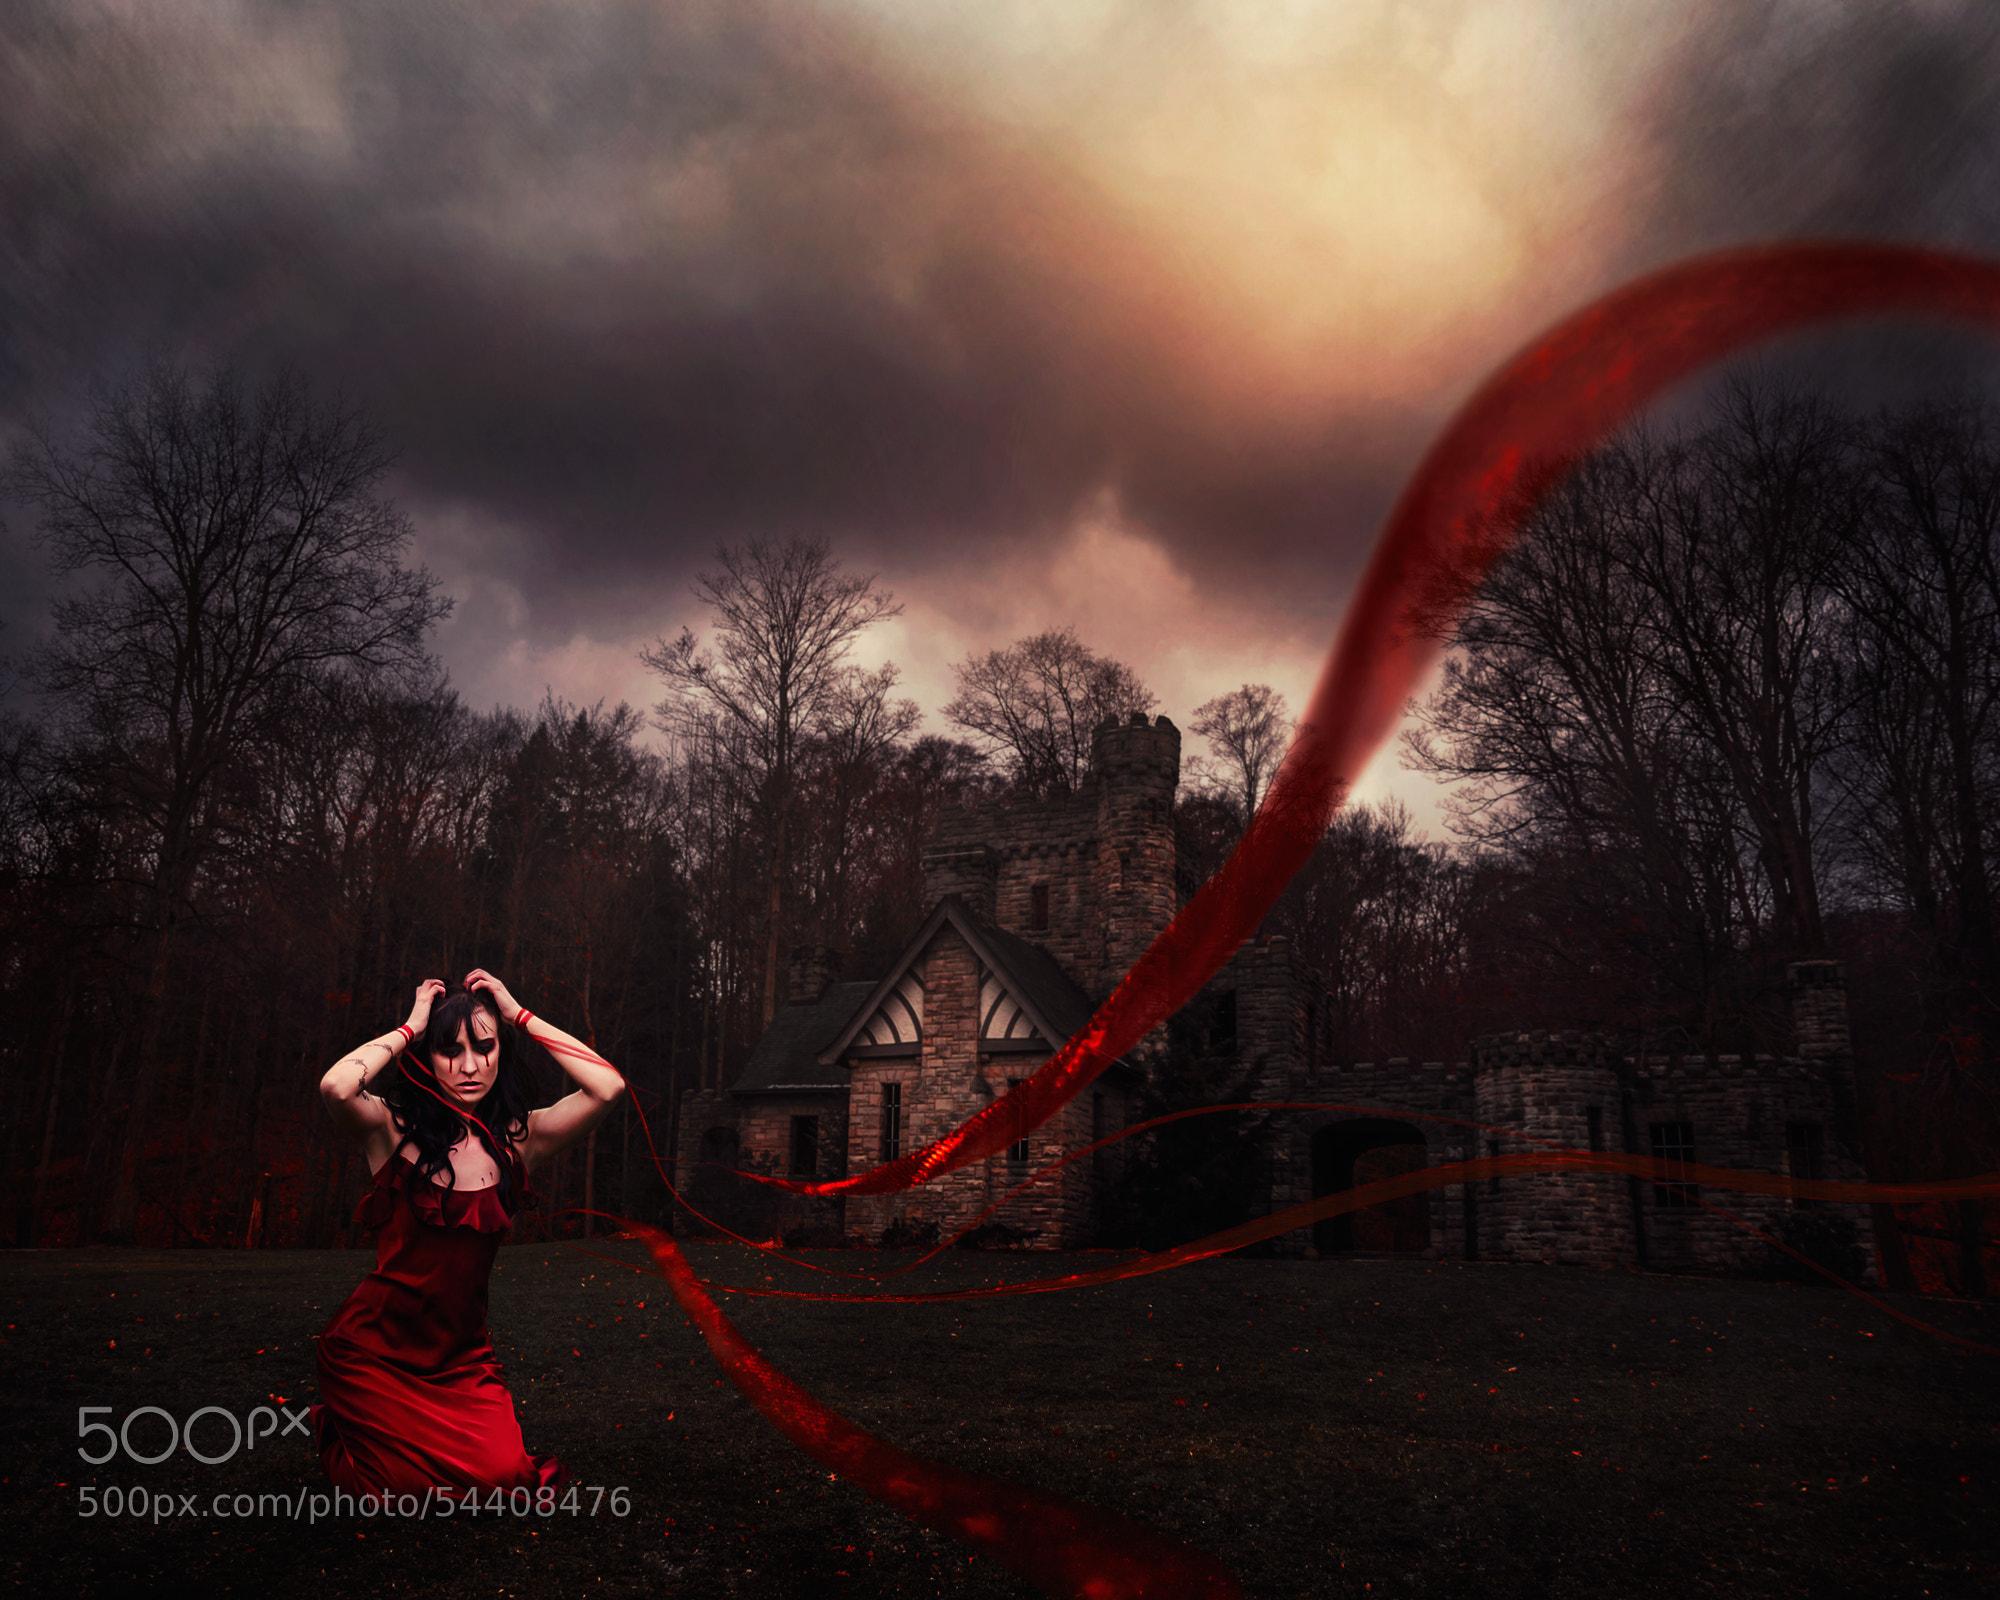 Photograph Loneliness of the Regretful Heart by Julz Kirschenbaum on 500px